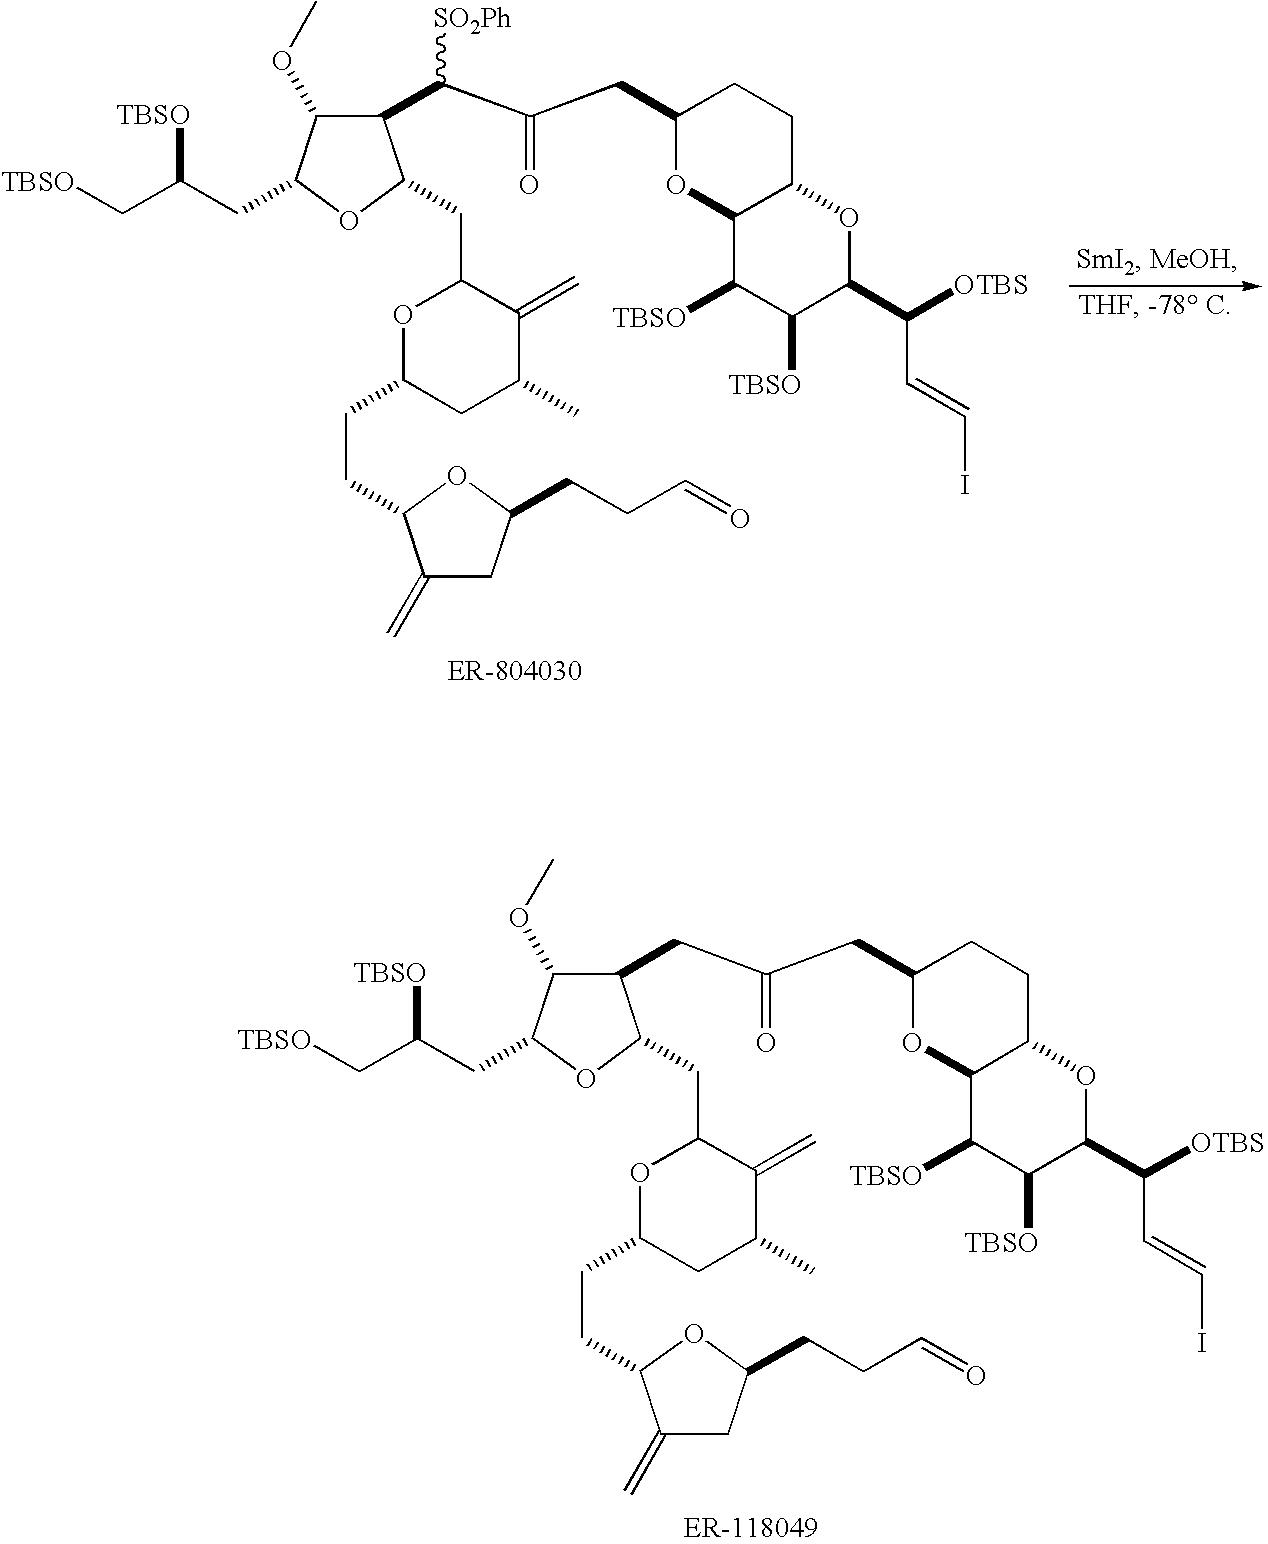 samarium diiodide organic systhesis Sequential intramolecular reformatsky/nucleophilic acyl organic synthesis using samarium diiodide valent samarium species: reduction of organic.